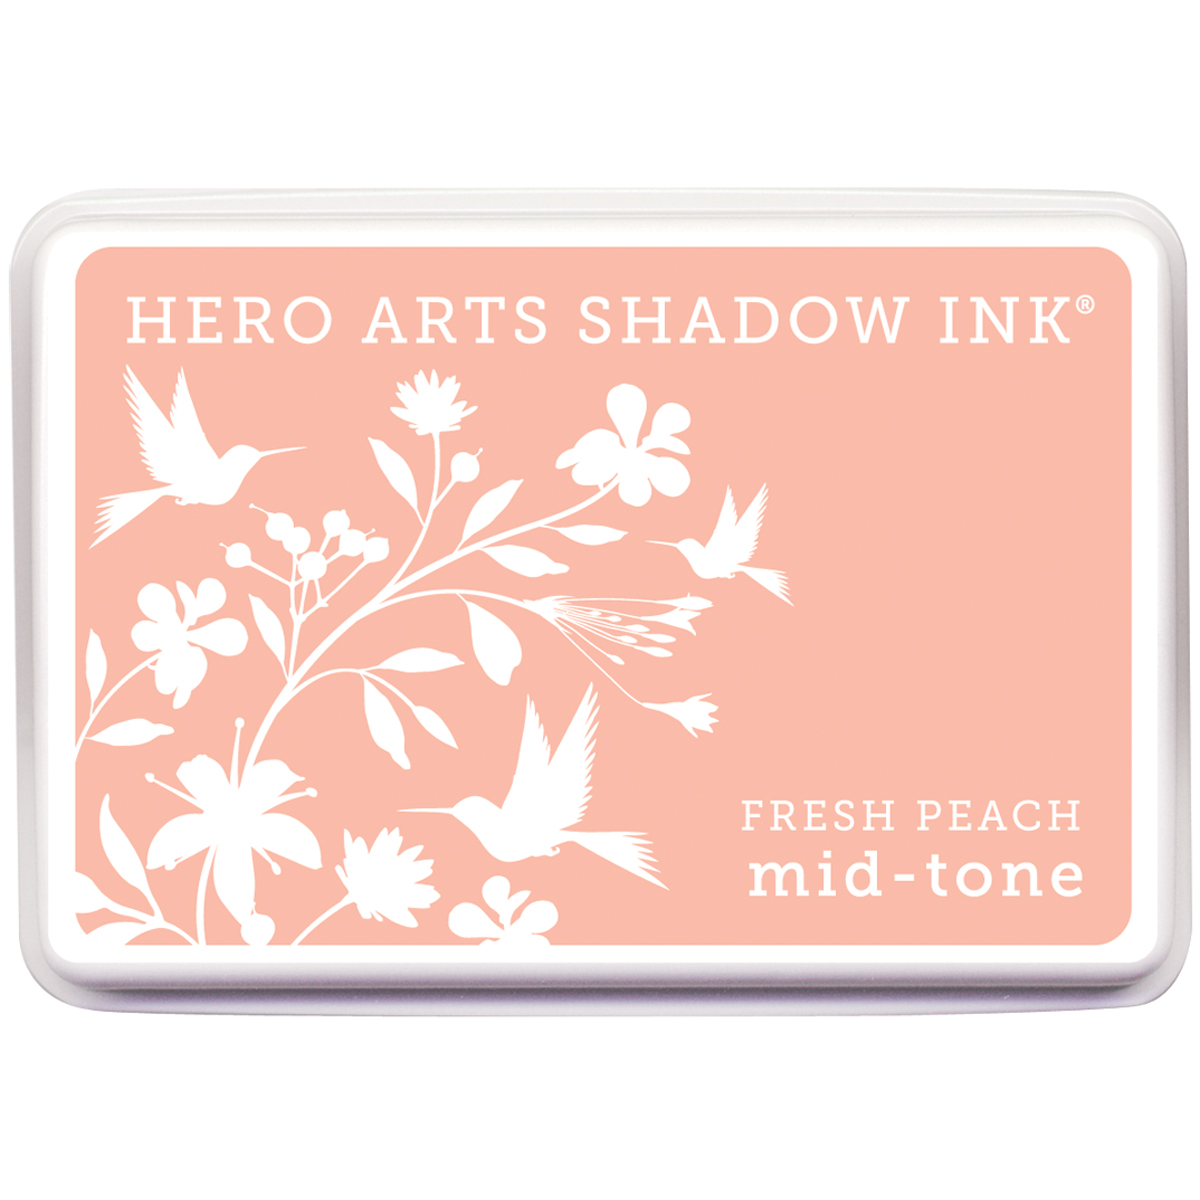 Hero Arts Midtone Shadow Ink Pad-Fresh Peach